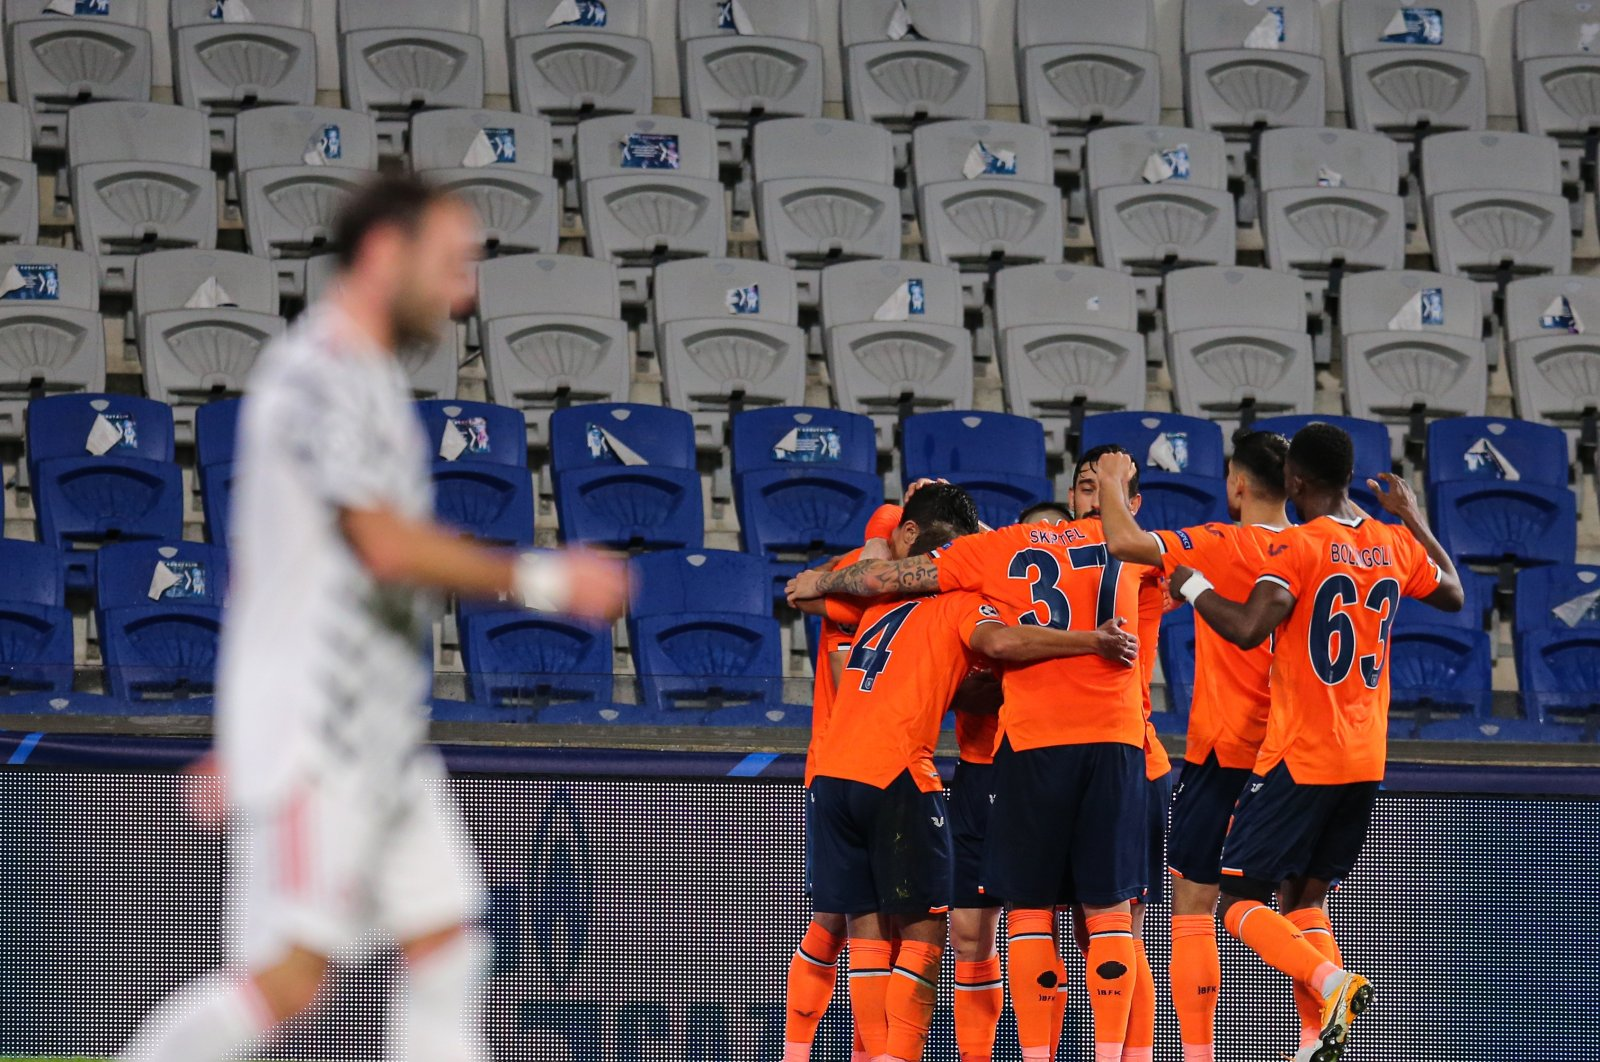 Istanbul Başakşehir players cheer after a goal in Istanbul Fatih Terim Stadium, Nov. 4, 2020. (AA Photo)